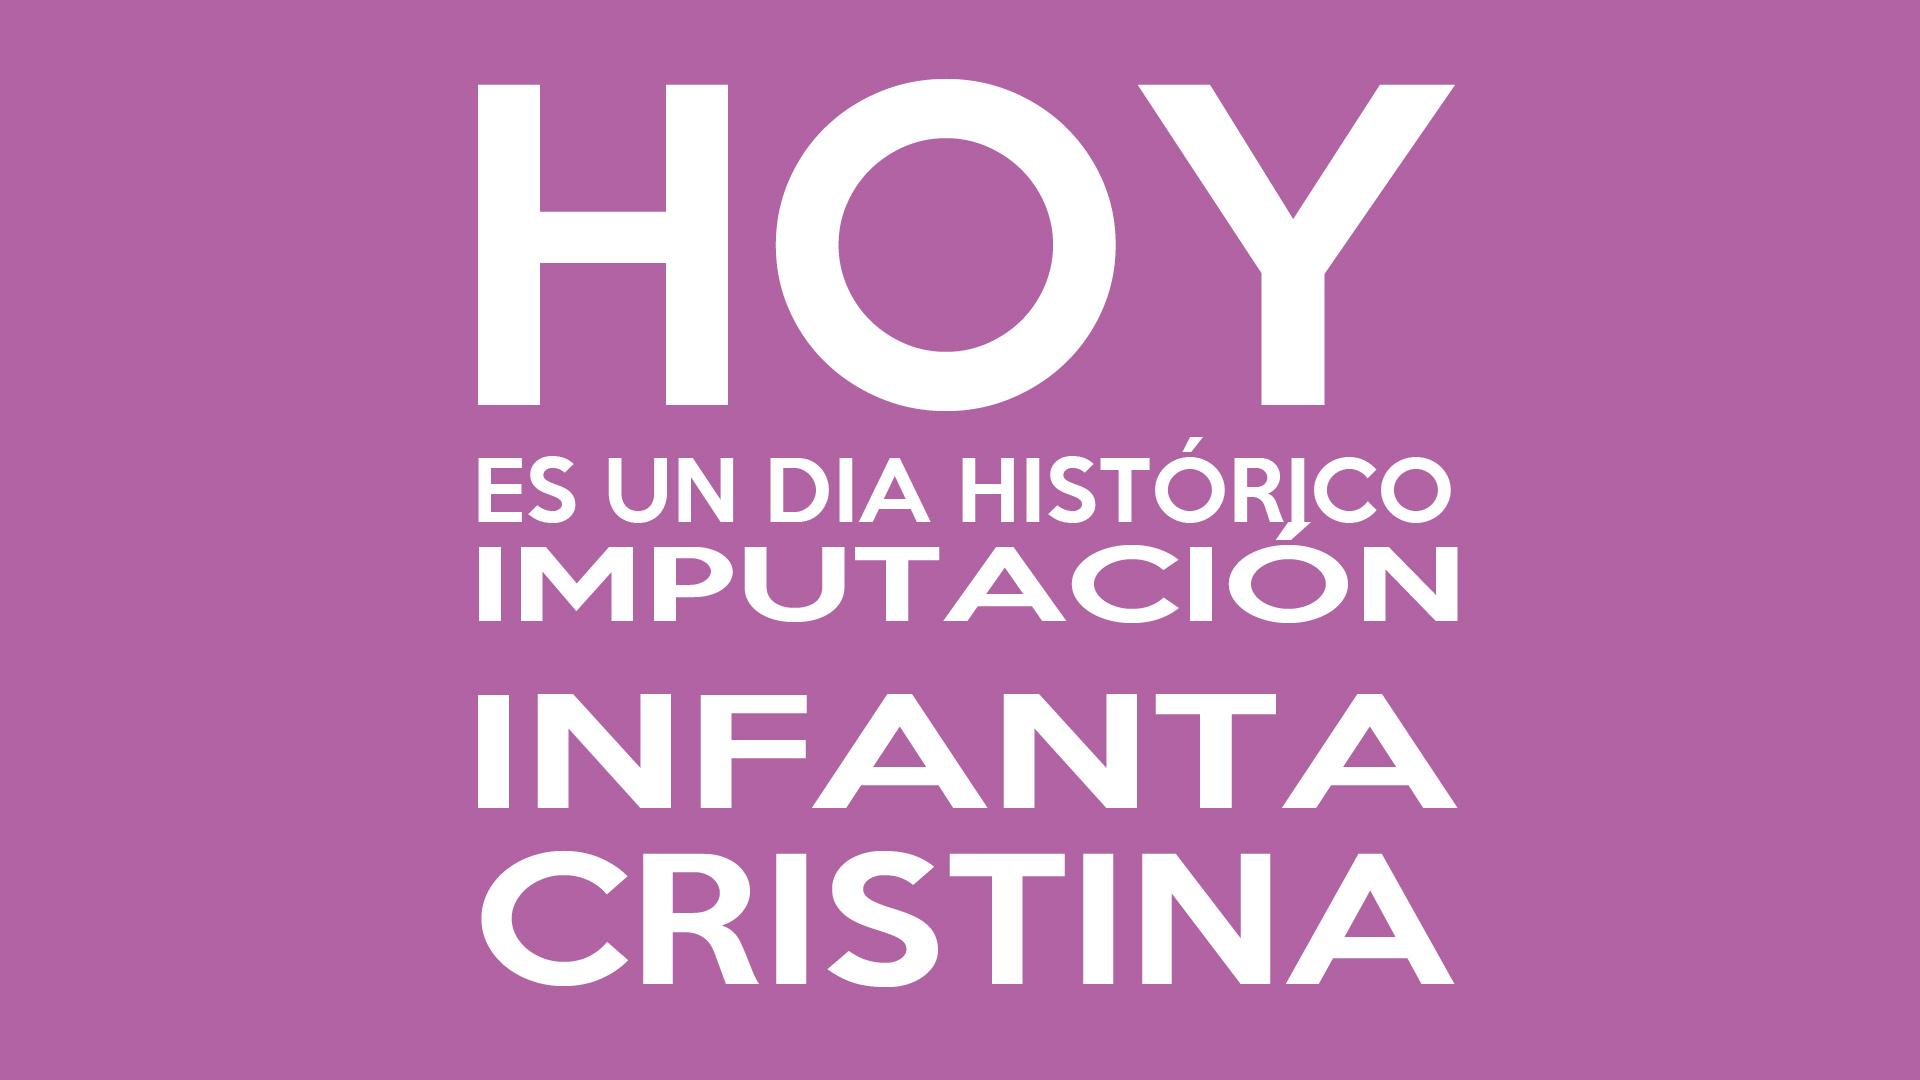 imputancion infantita